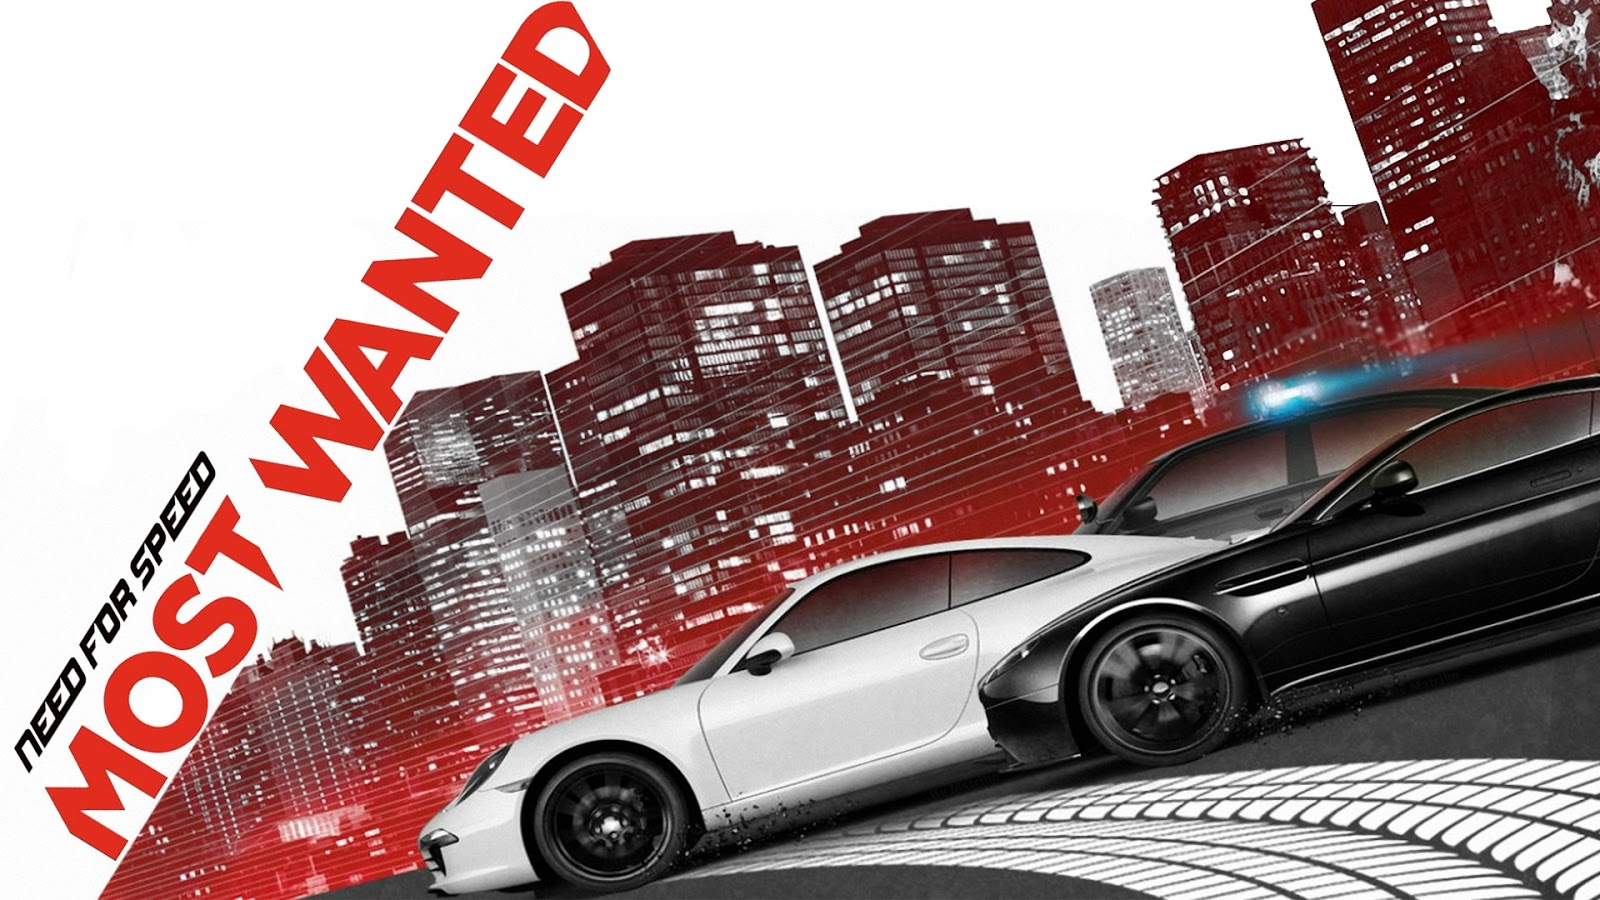 all new pix1 Hd Nfs Most Wanted Wallpaper 1600x900